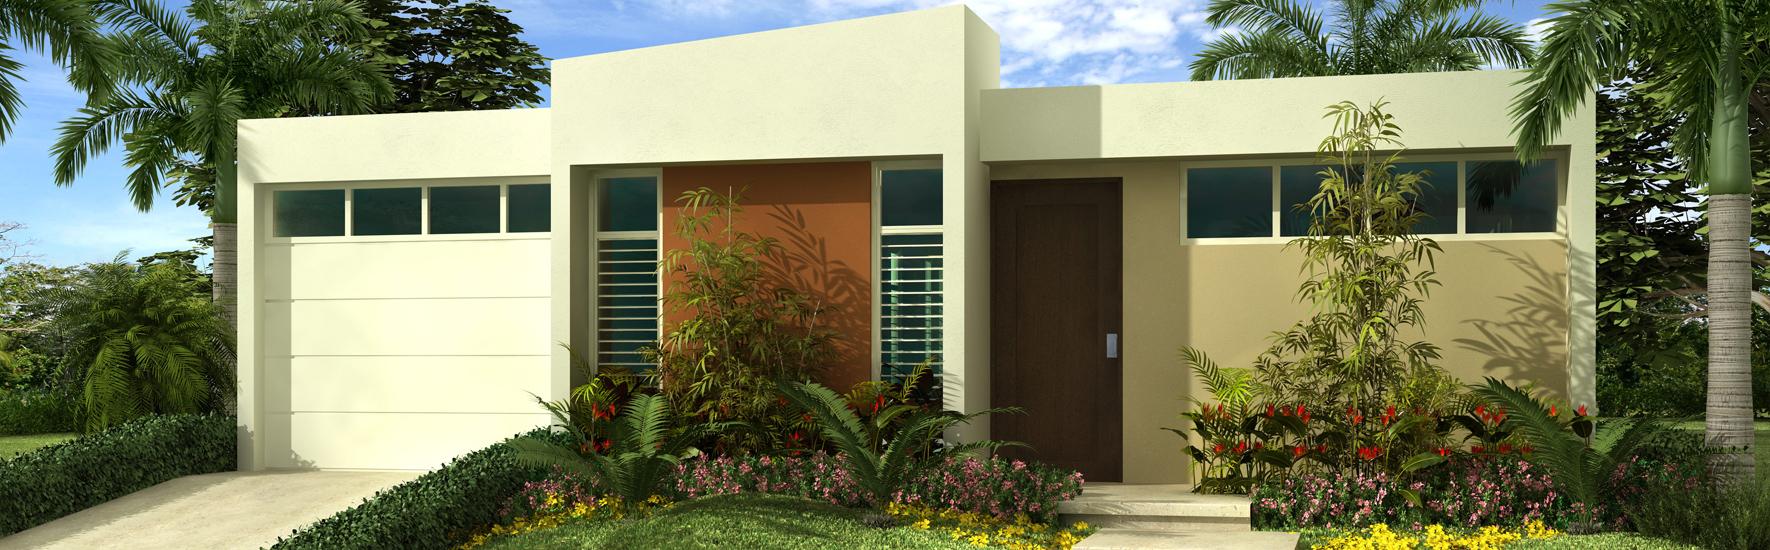 Casabella prefab homes in puerto rico all inclusive for Fachadas de casas modernas puerto rico